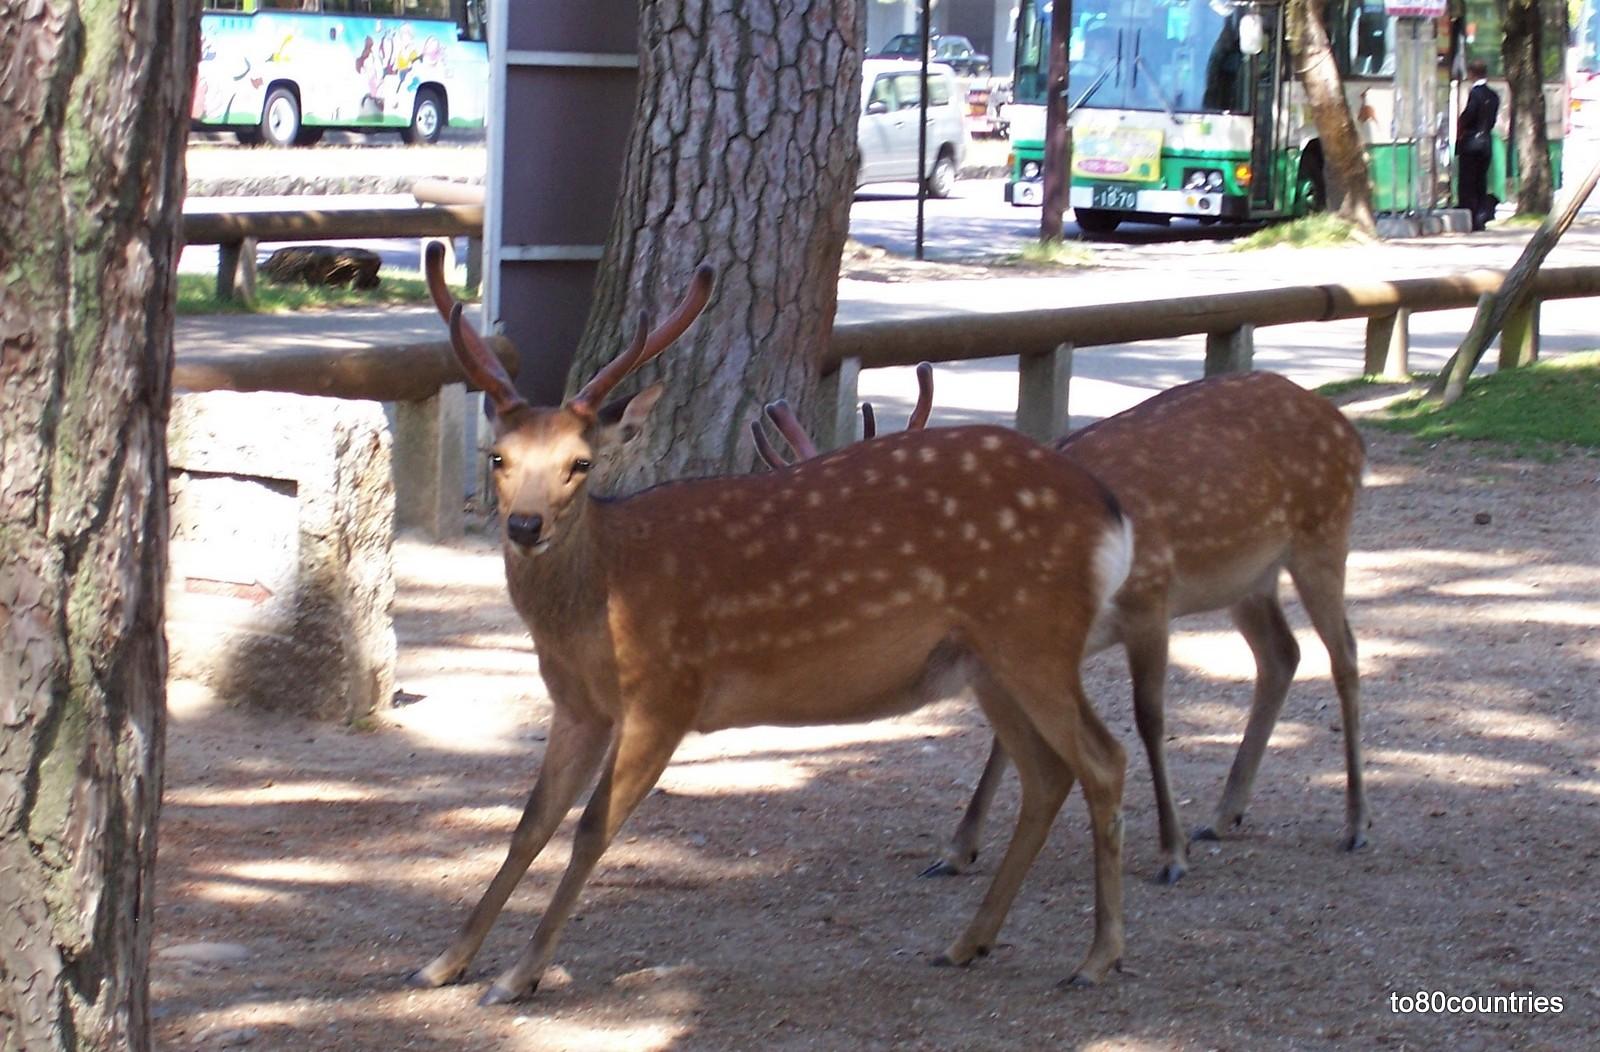 Nara-Park in Japan